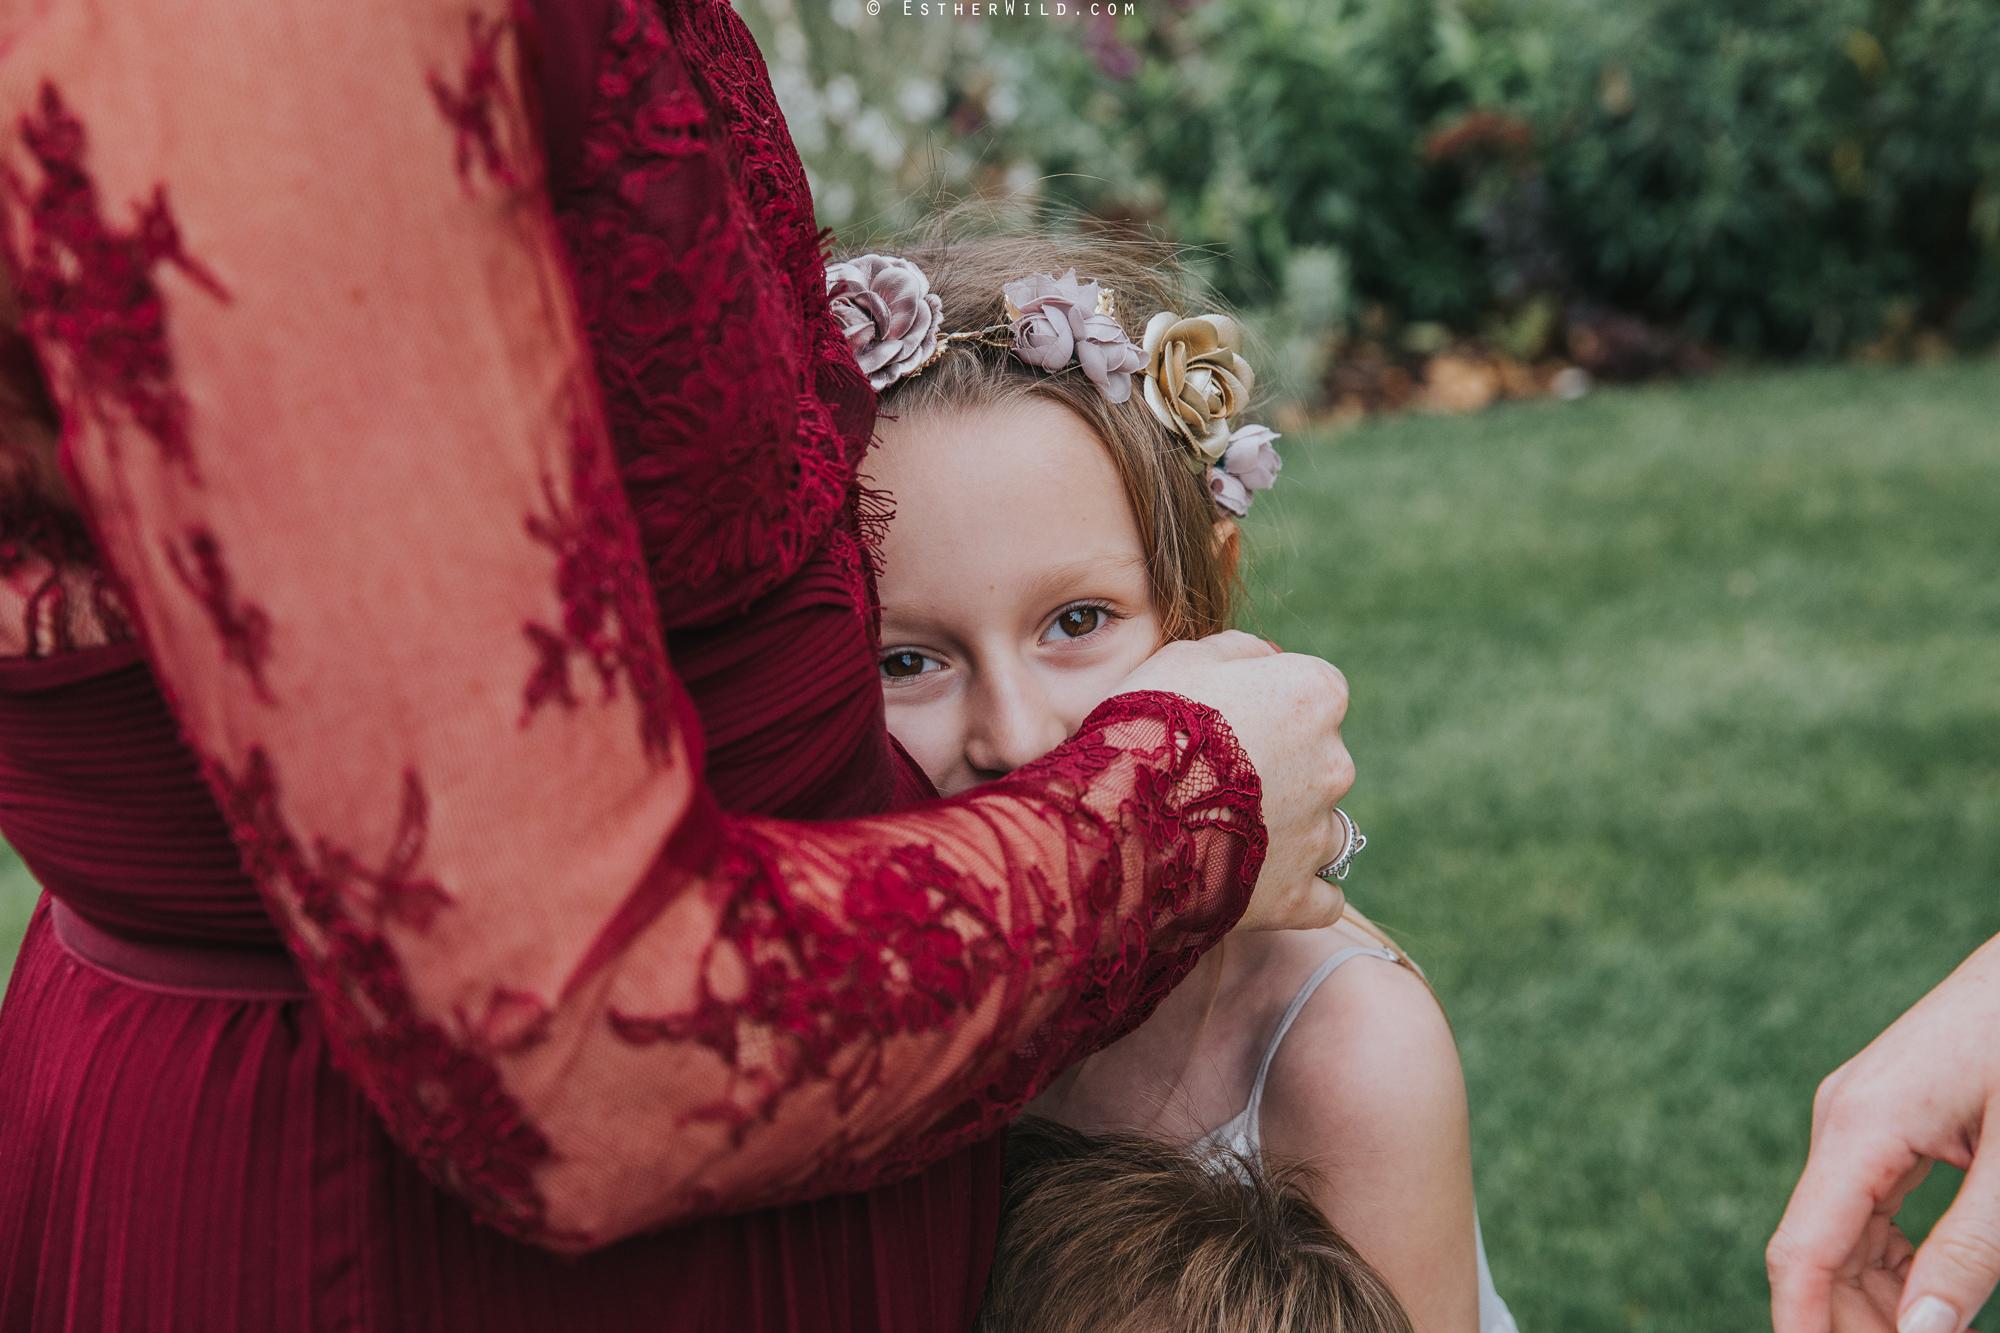 Reading_Room_Weddings_Alby_Norwich_Photographer_Esther_Wild_IMG_1654.jpg